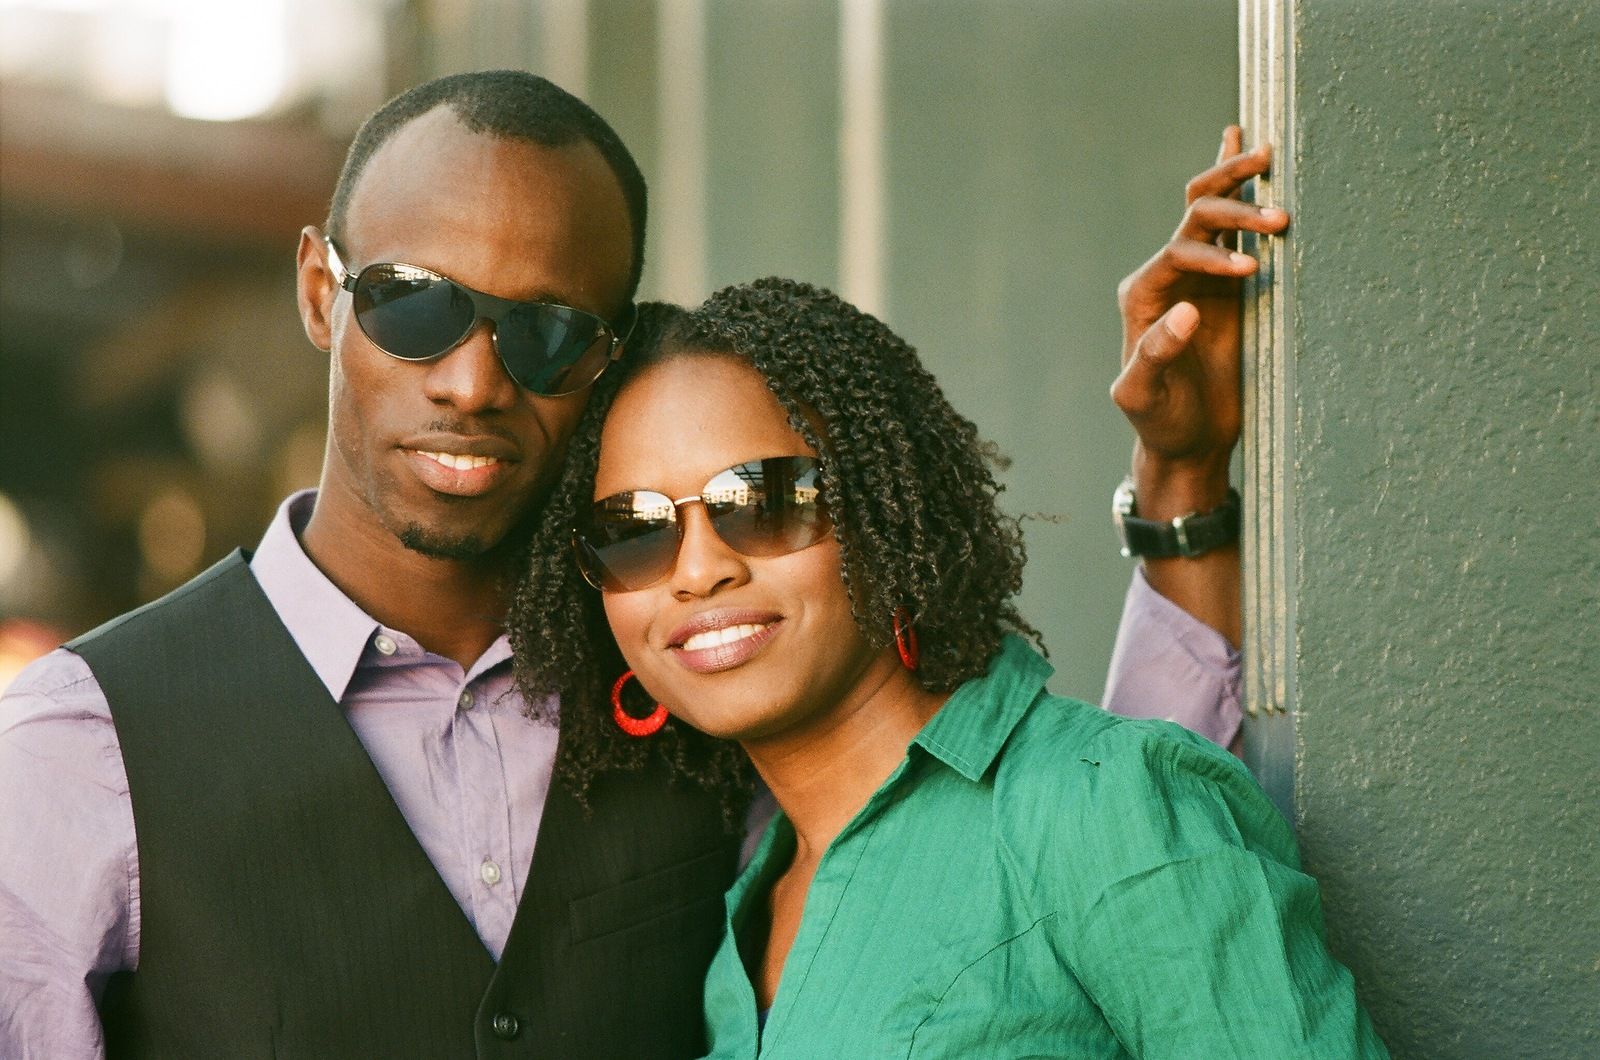 engaged couple wearing sunglasses